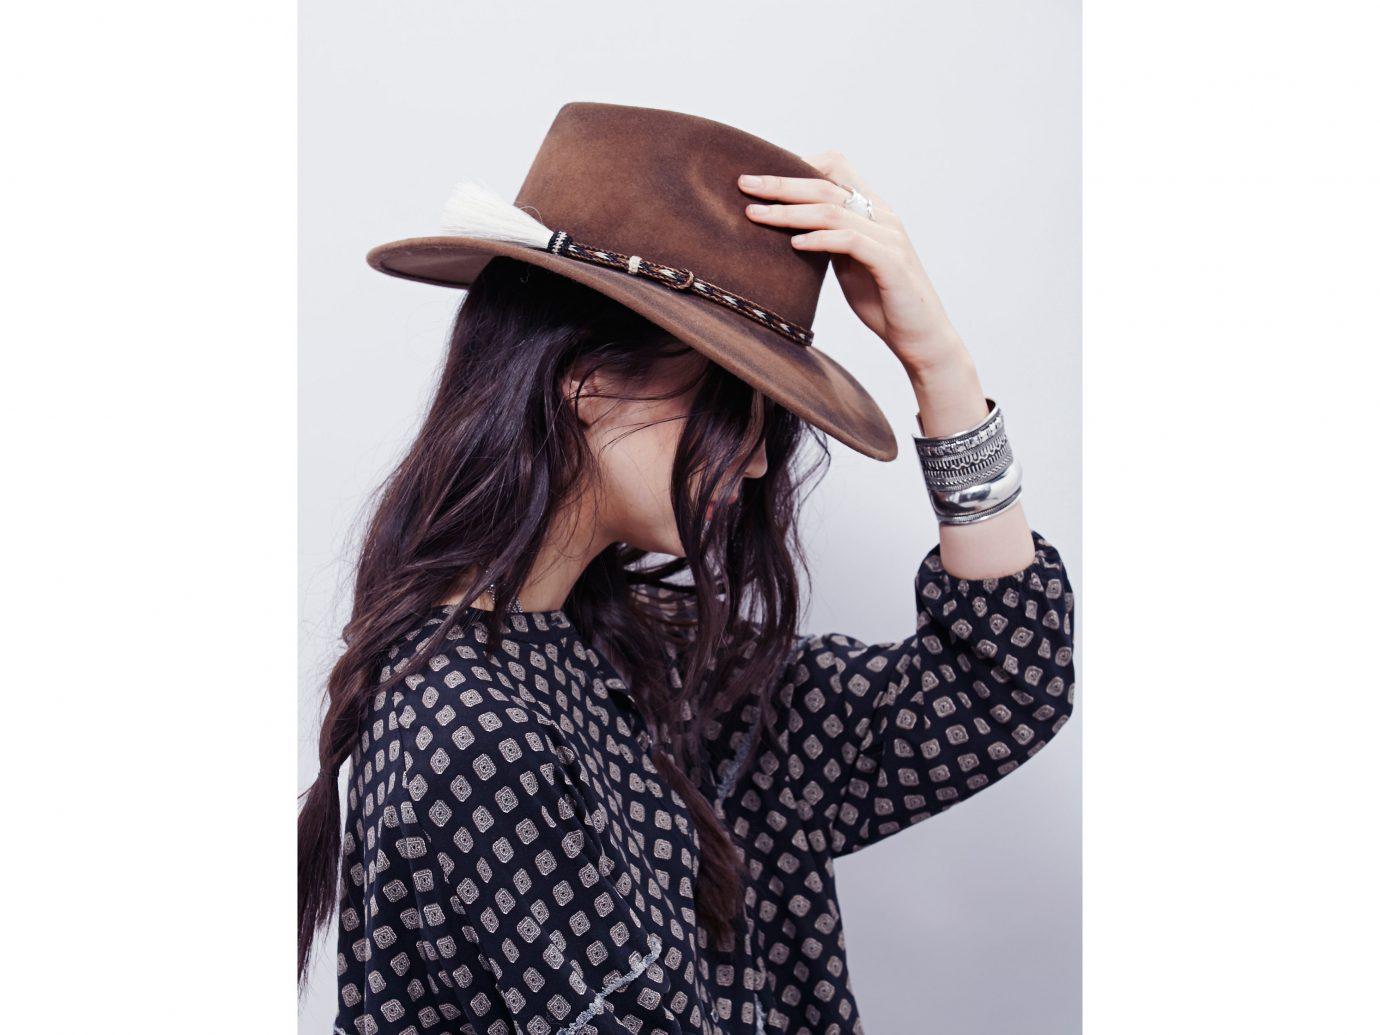 Style + Design person clothing woman hat cap pattern fashion accessory Design polka dot outerwear neck headgear fedora